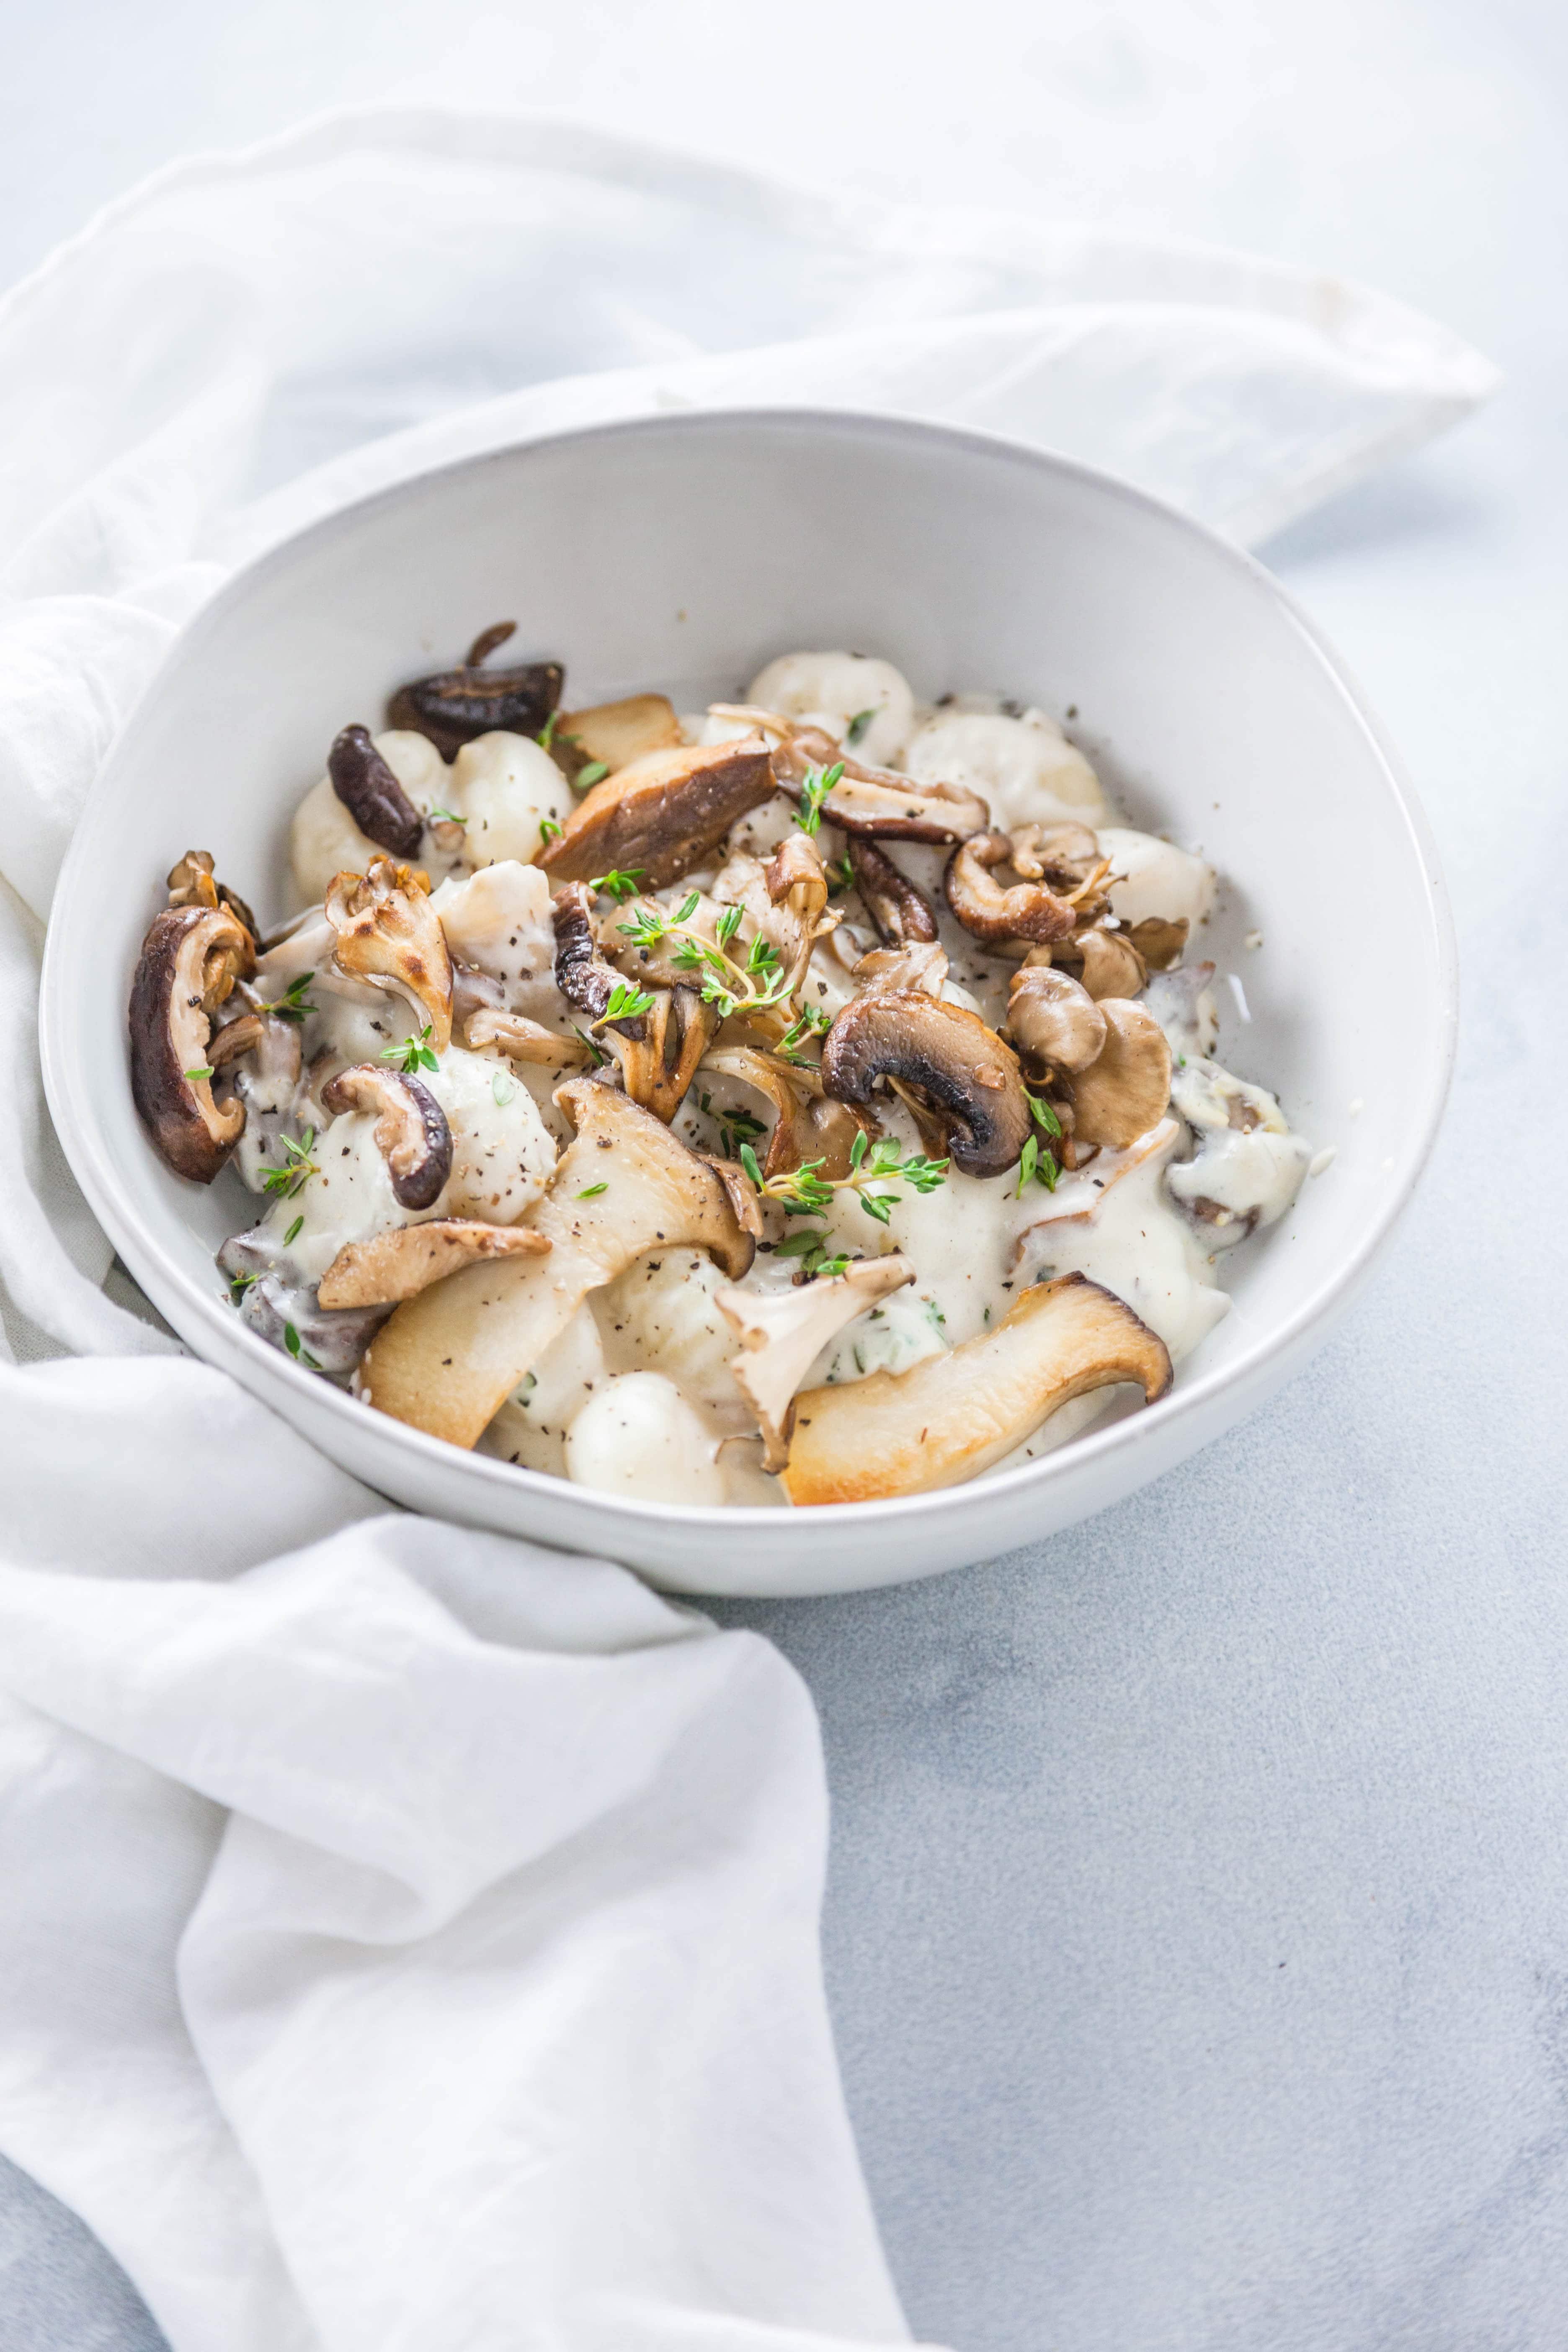 Creamy Mushroom Gnocchi in a white bowl.